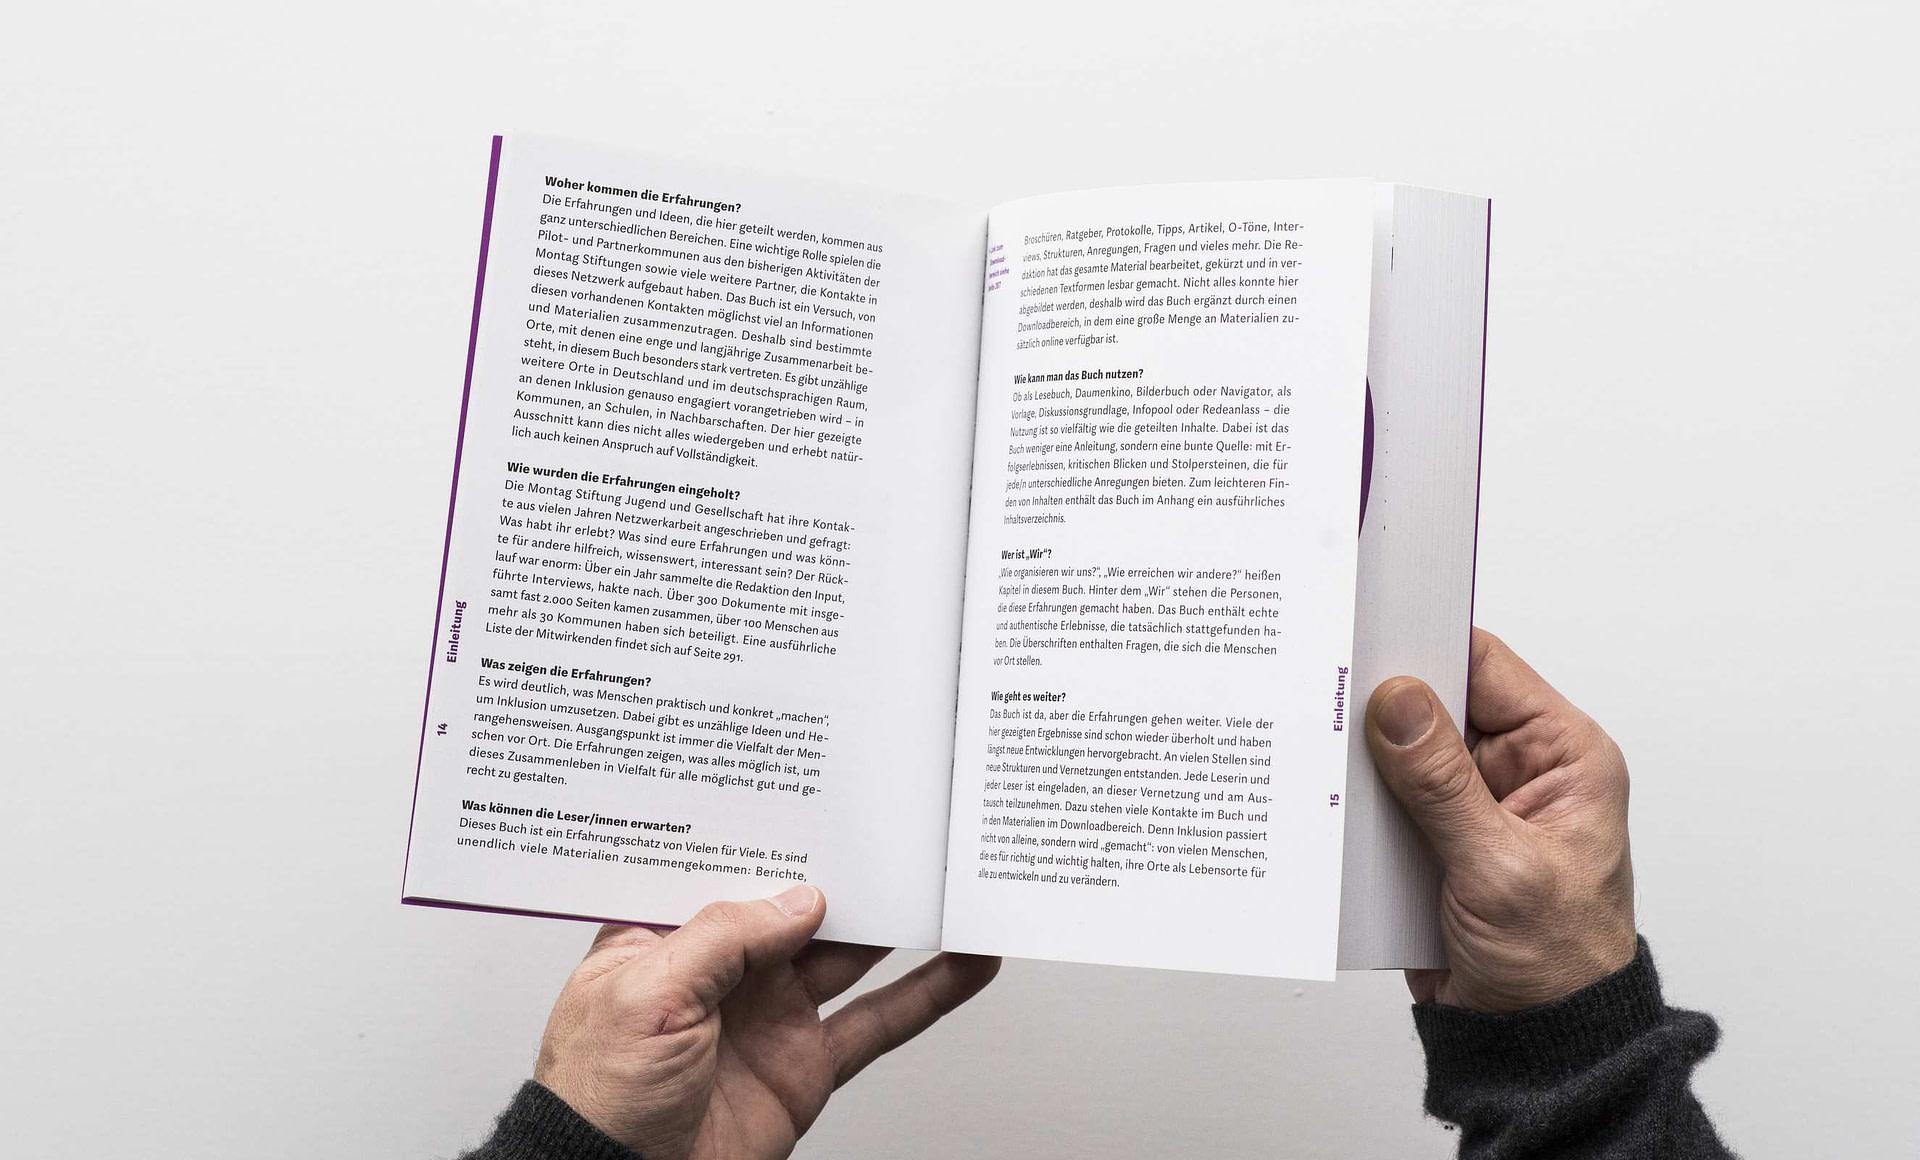 inclusion-fieldbook-4-2650x1600px